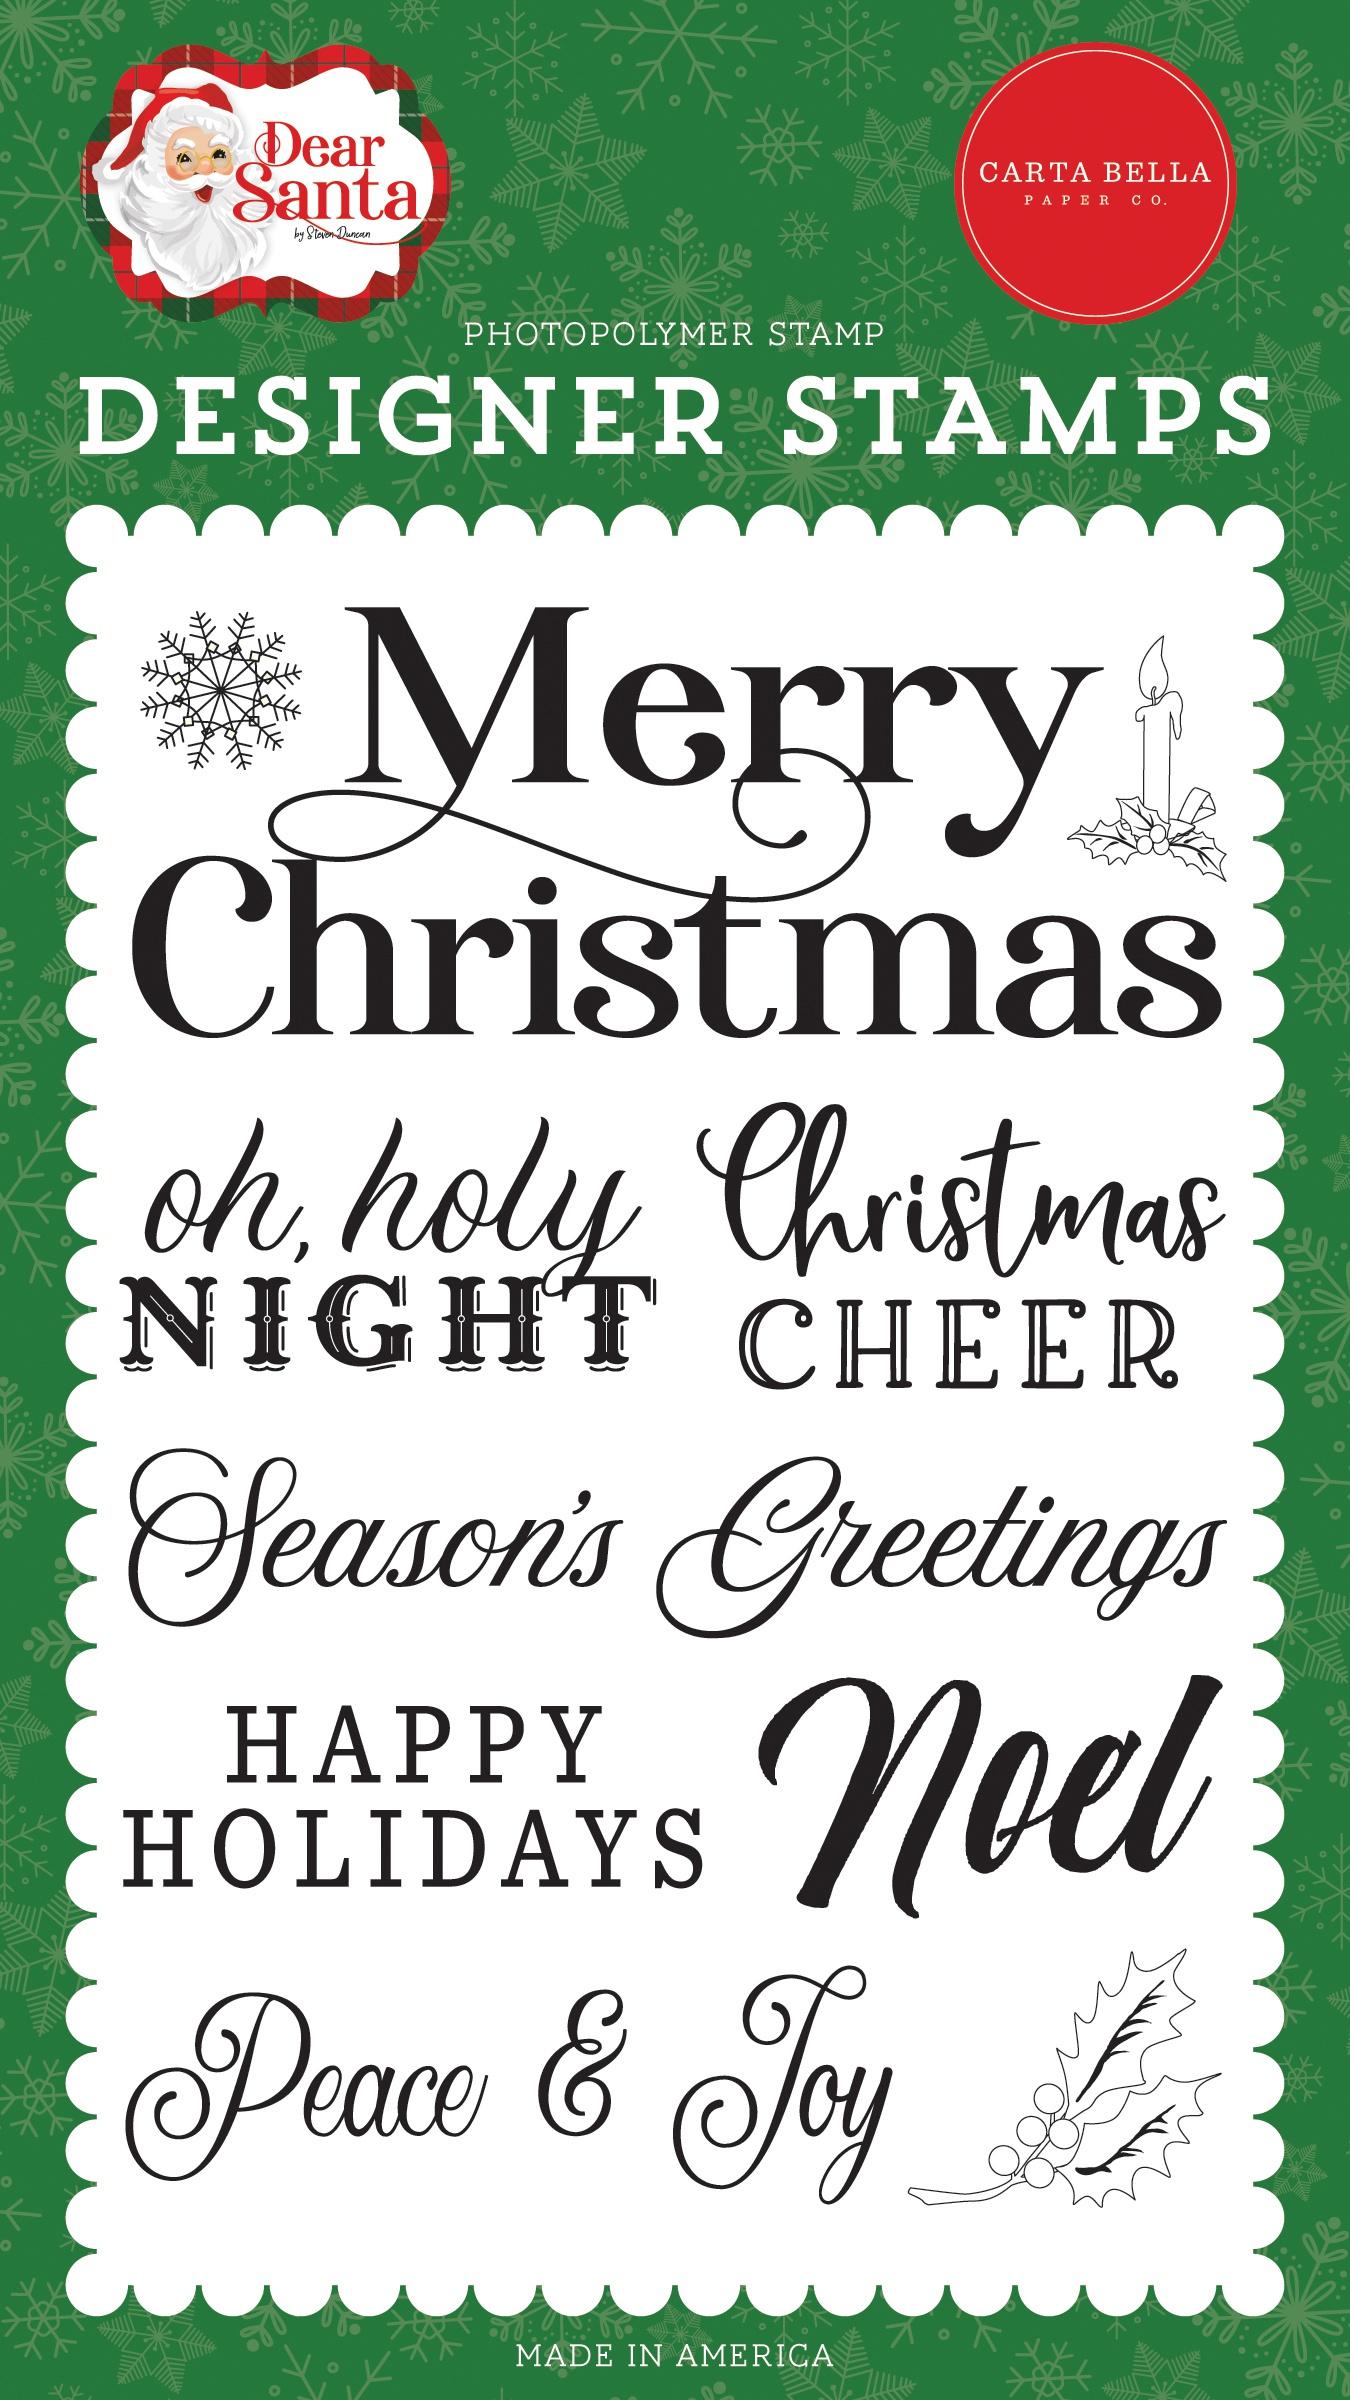 Carta Bella - Stamps - Merry Christmas Sentiment